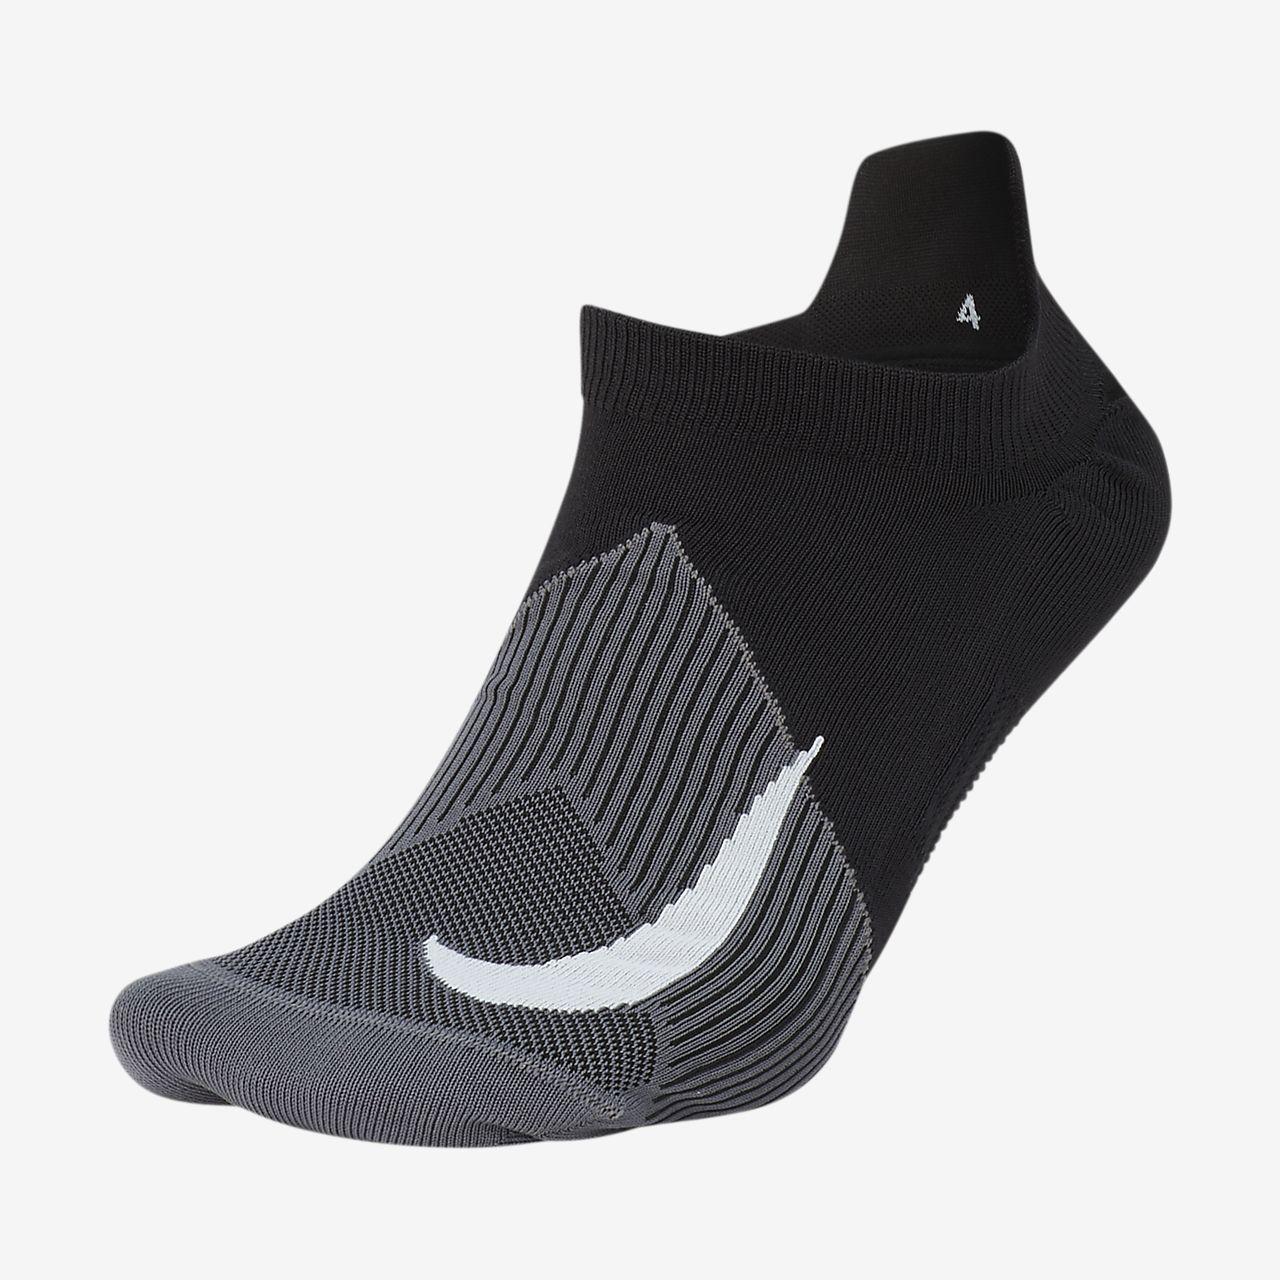 b5184ff25bdc4 Nike Elite Lightweight No-Show Running Socks